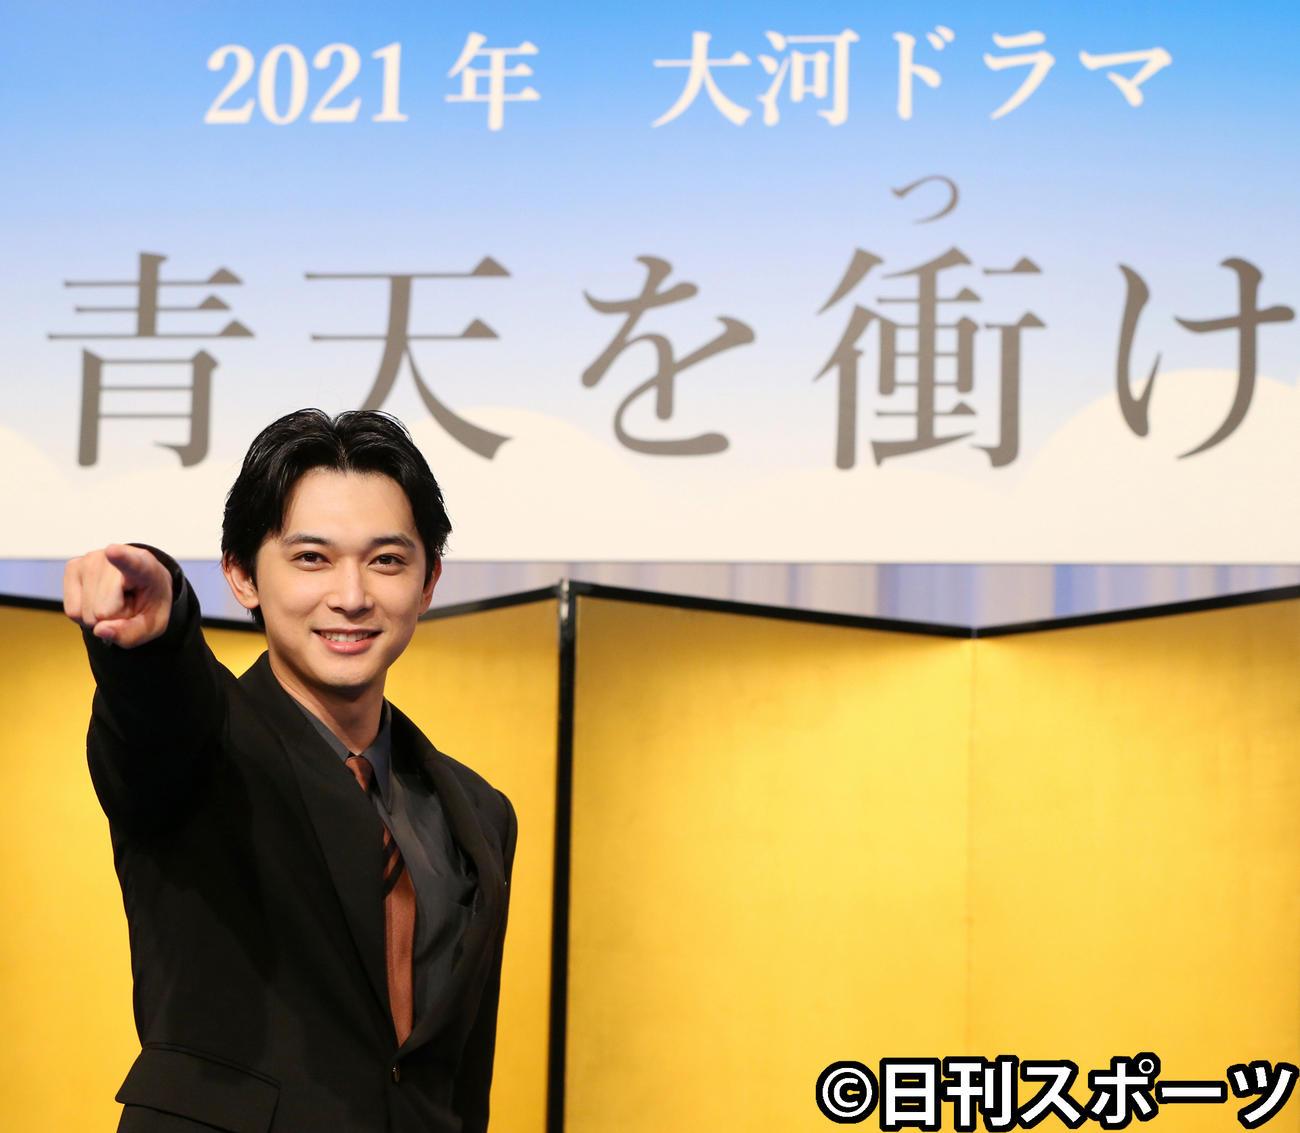 NHK大河ドラマ「青天を衝け」制作・主演発表会見でポーズを決める渋沢栄一役の吉沢亮(2019年9月撮影)